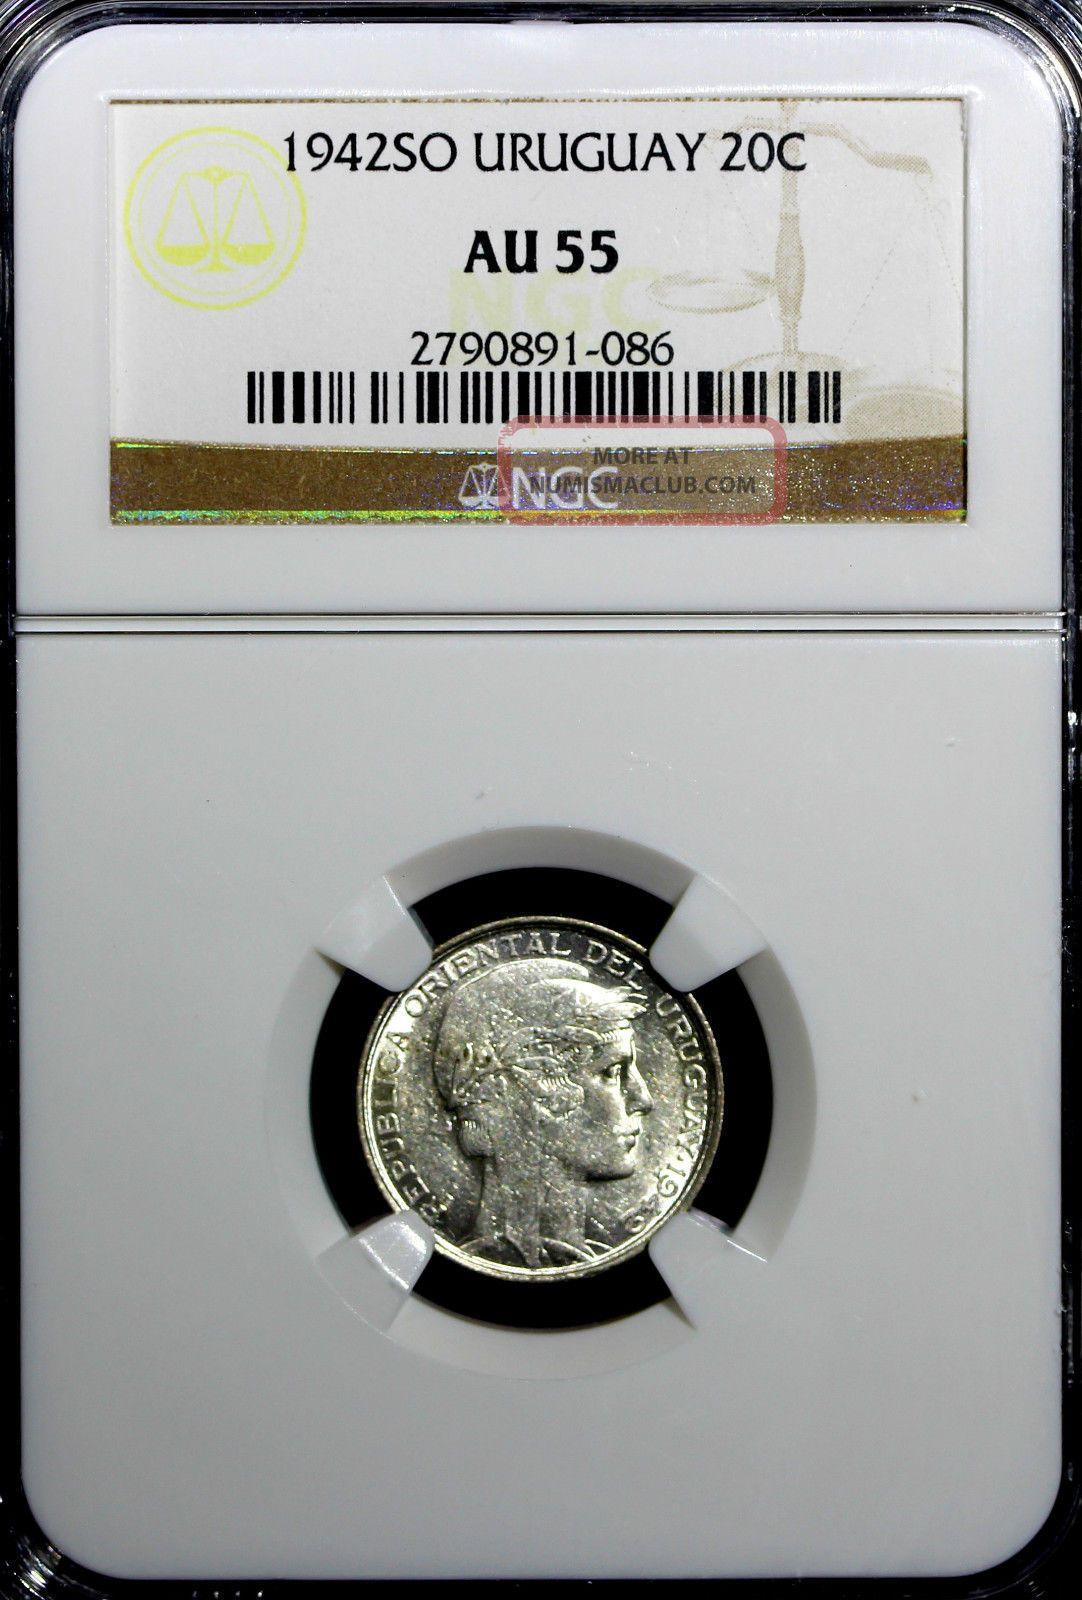 Uruguay Silver 1942 So 20 Centesimos Ngc Au55 Km 29 N/r South America photo